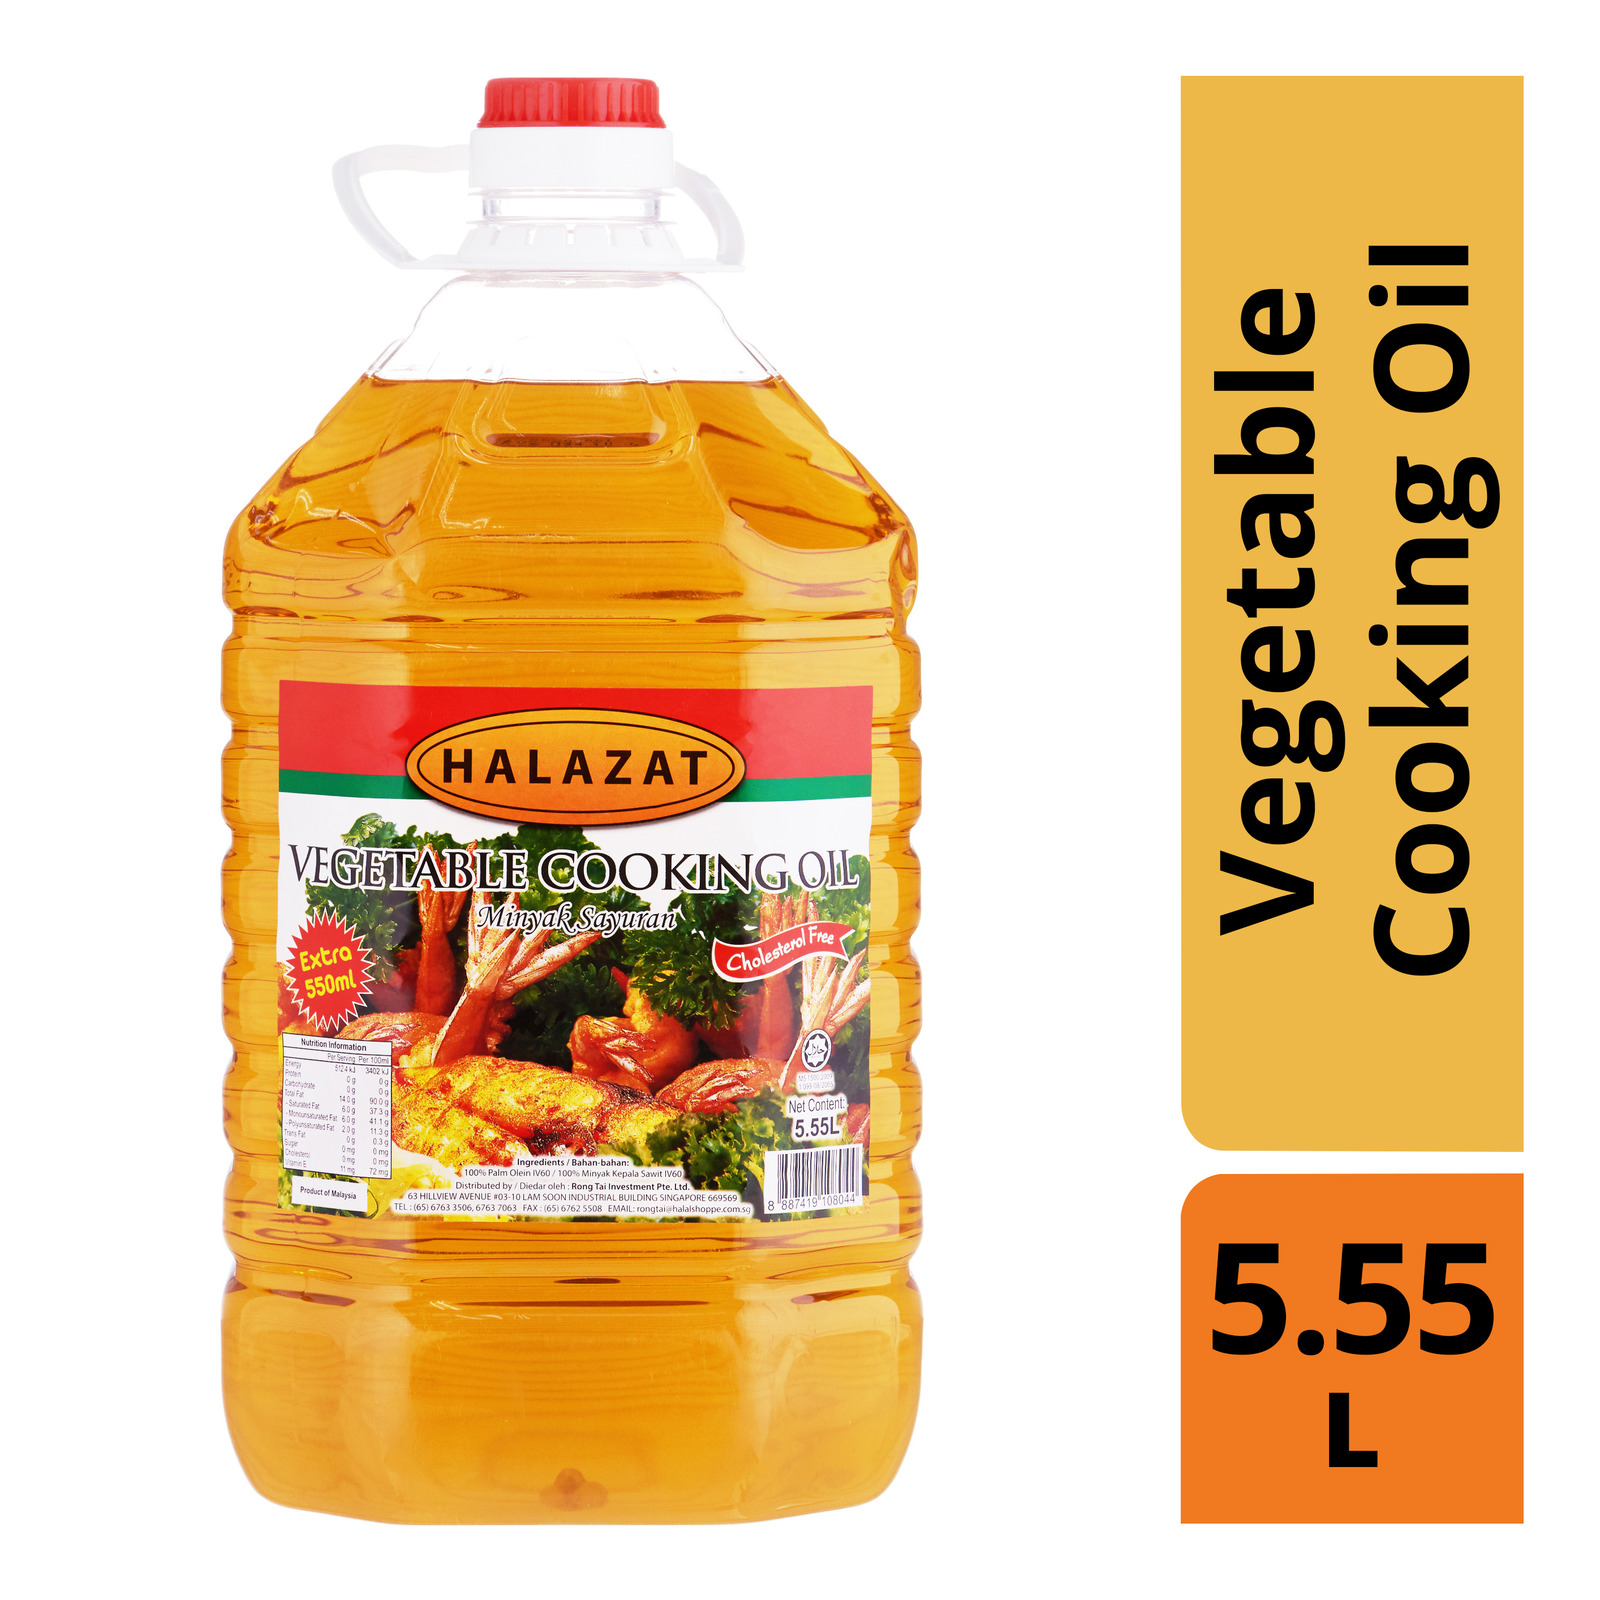 Halazat Vegetable Cooking Oil